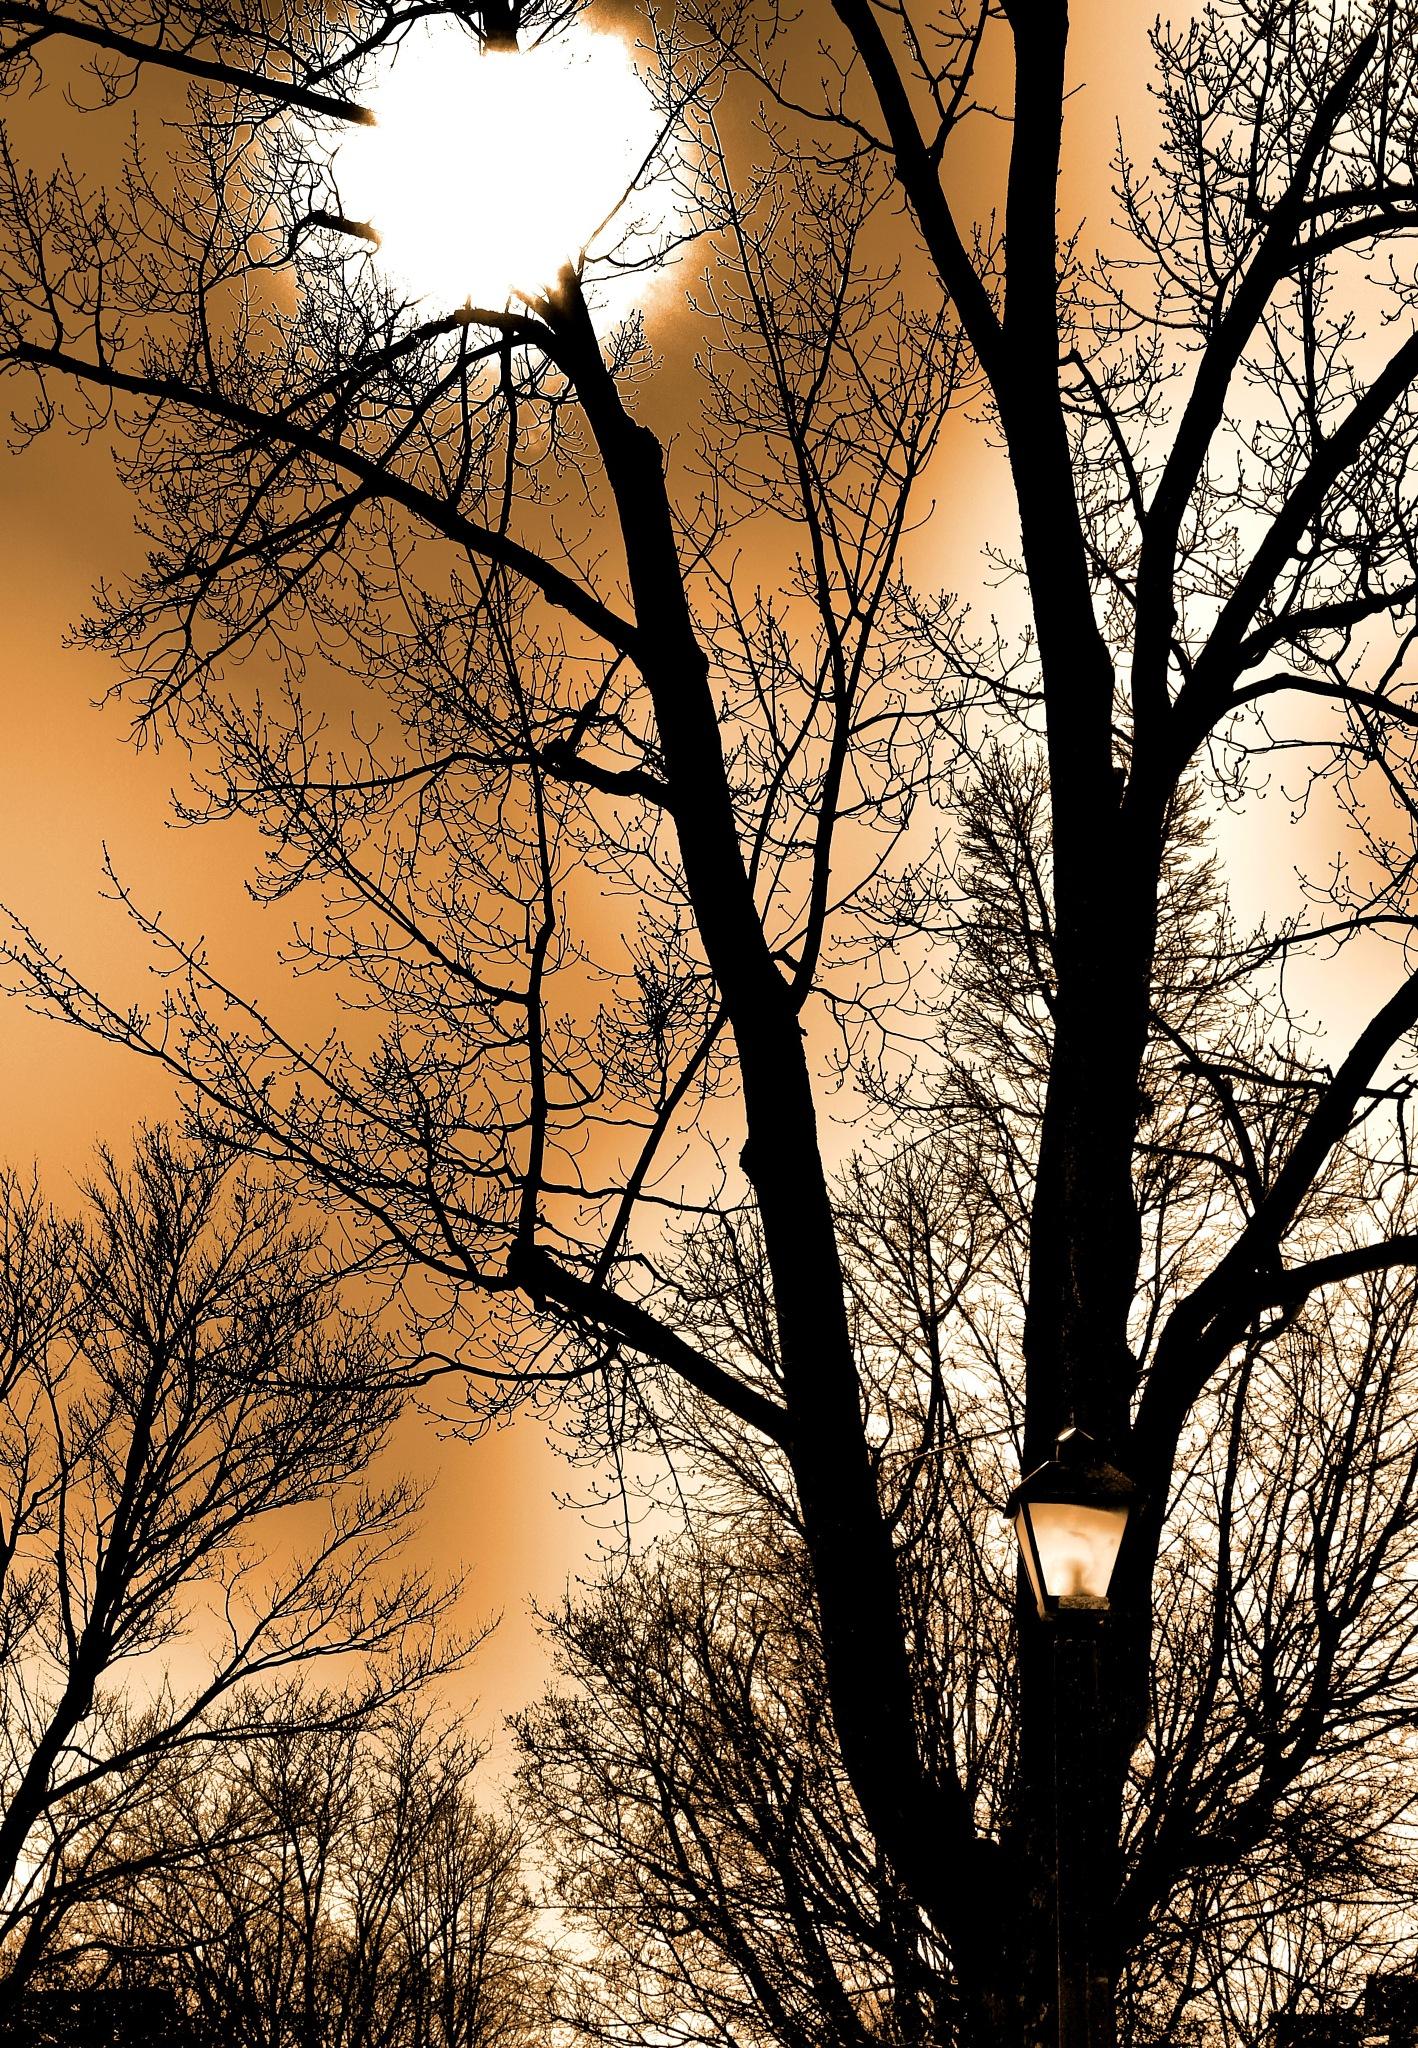 Dirty Sunset by Chris Carroll